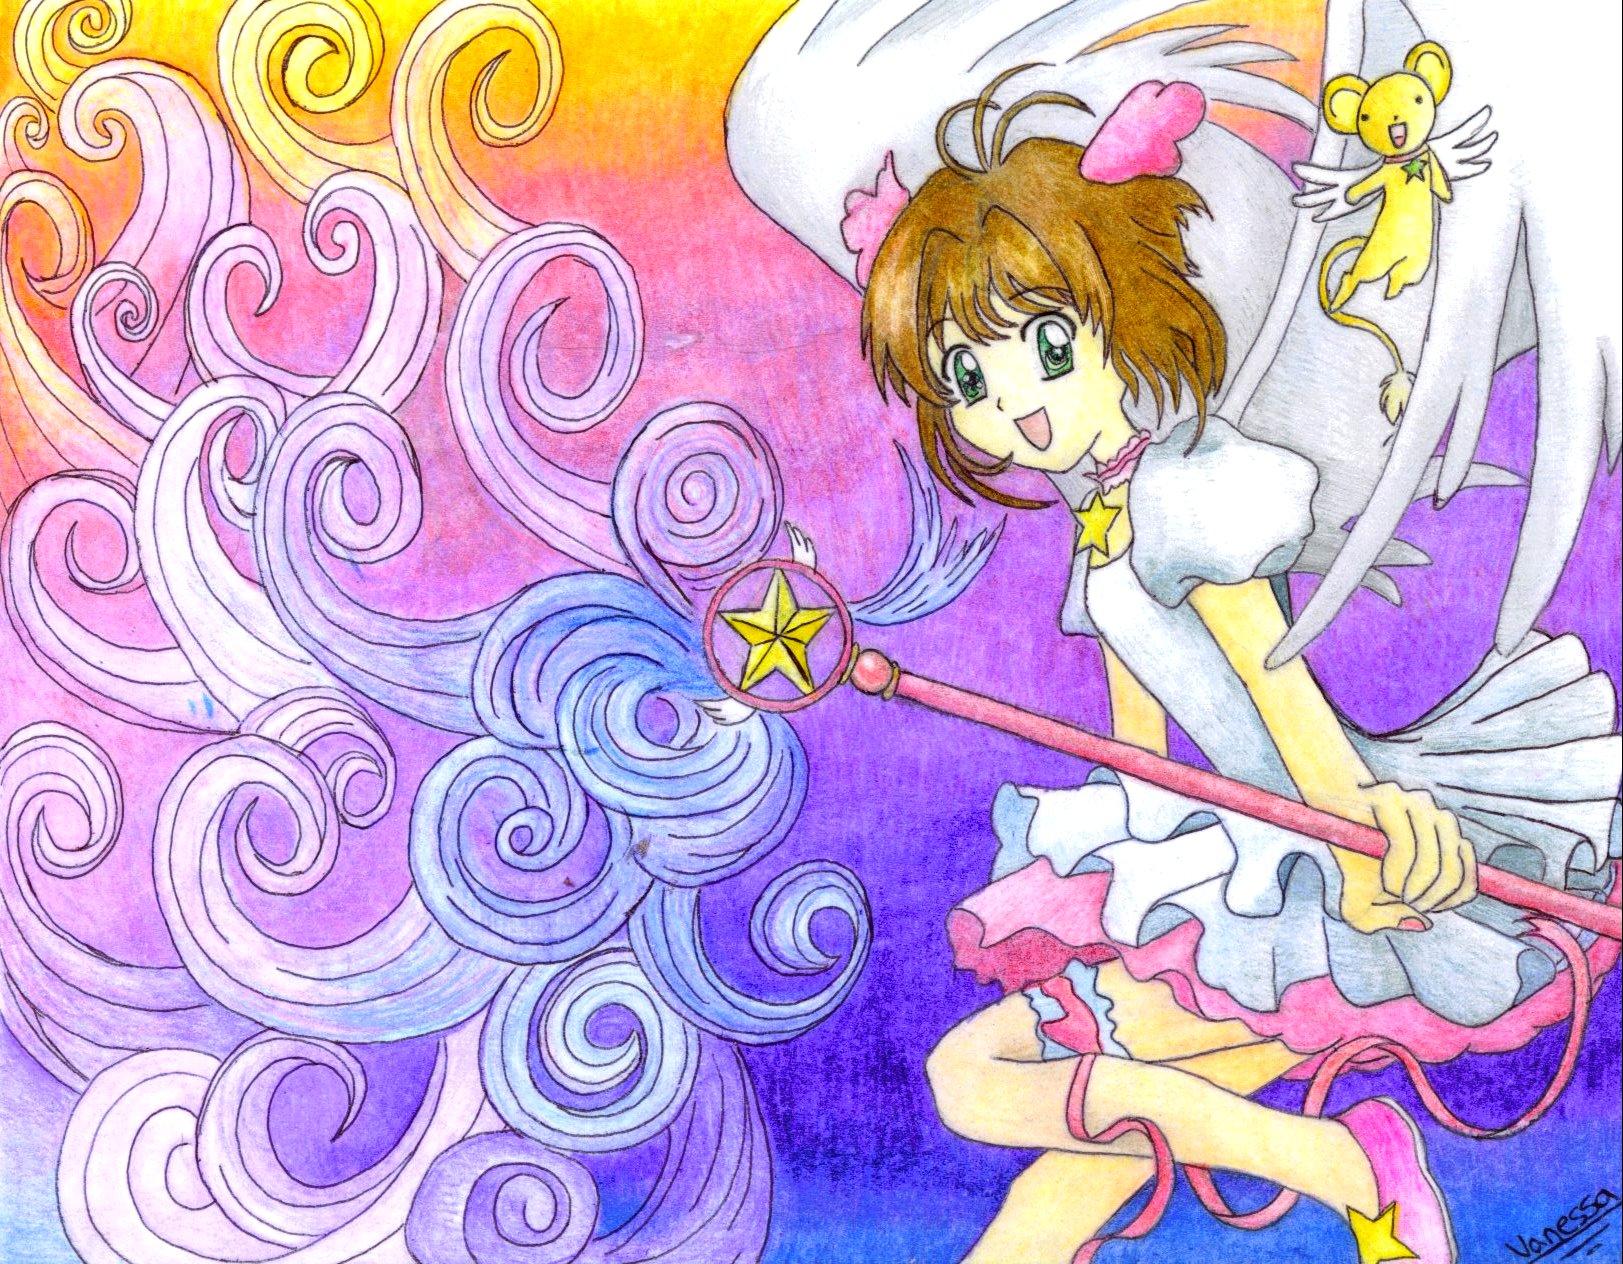 Cardcaptor Sakura!! by lilsoniclover